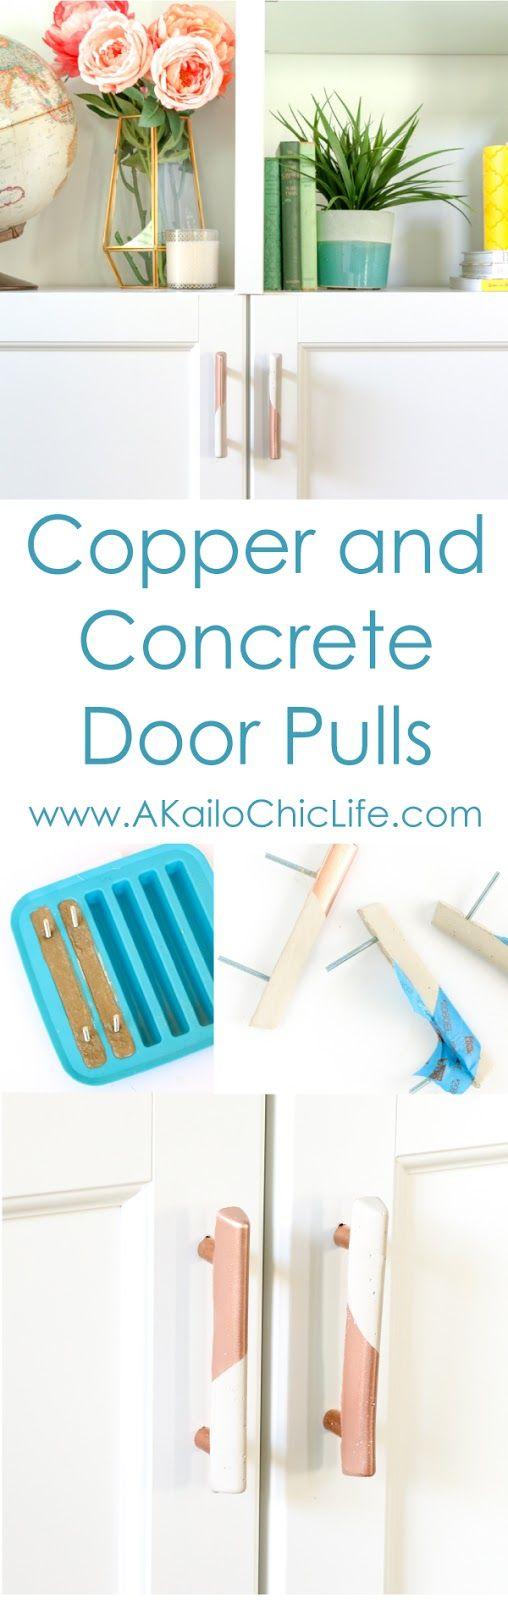 DIY It - Copper and Concrete Door Pulls - DIY project - industrial design - home decor - craft project - copper DIY